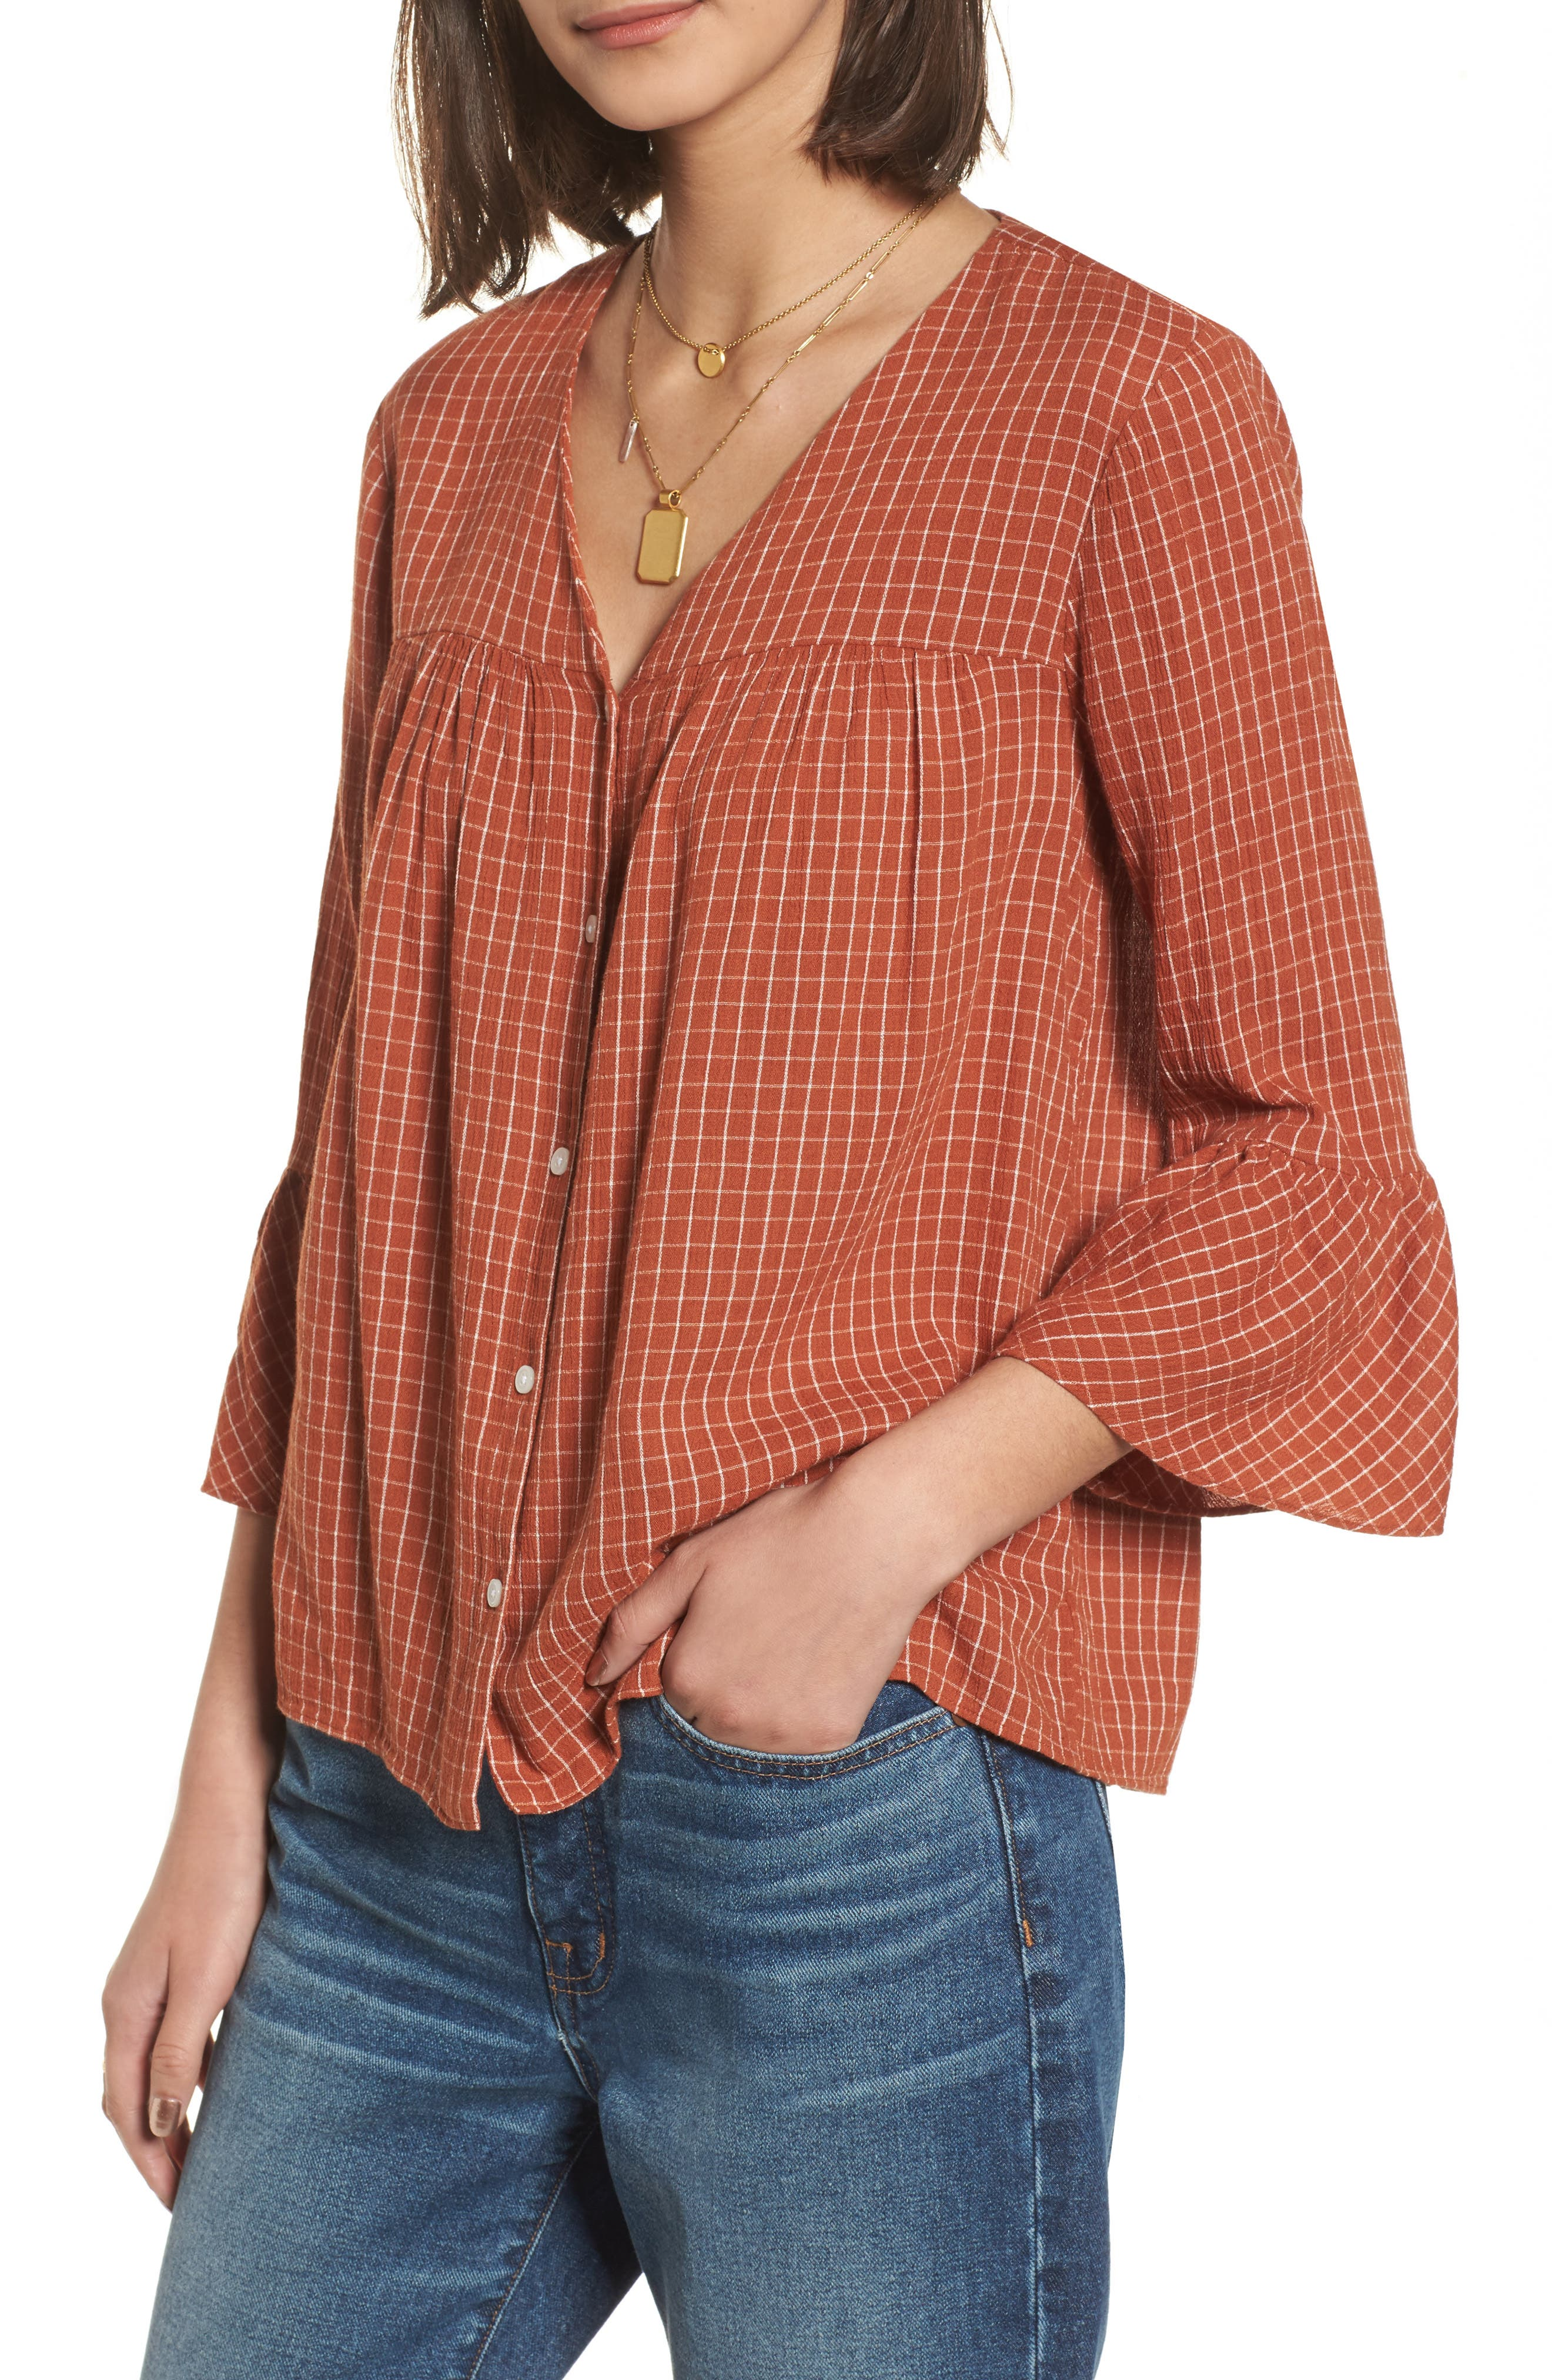 Veranda Bell Sleeve Shirt,                         Main,                         color, 800